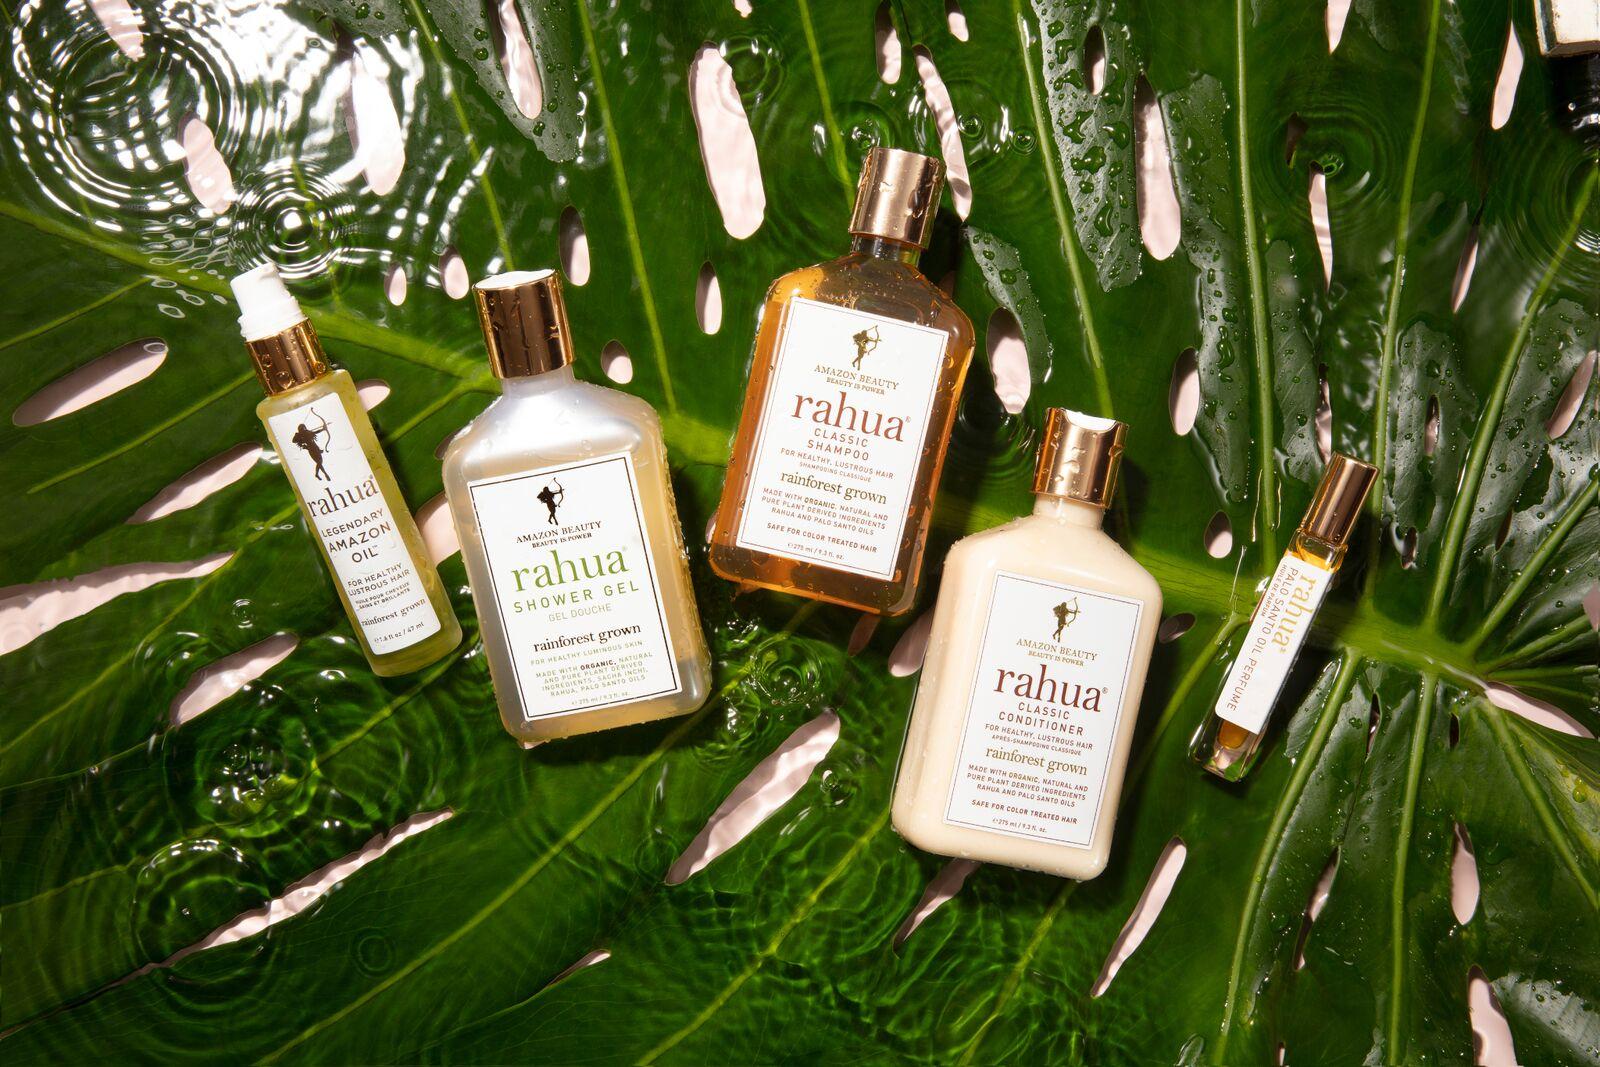 Rahua Product Family Photo.jpeg